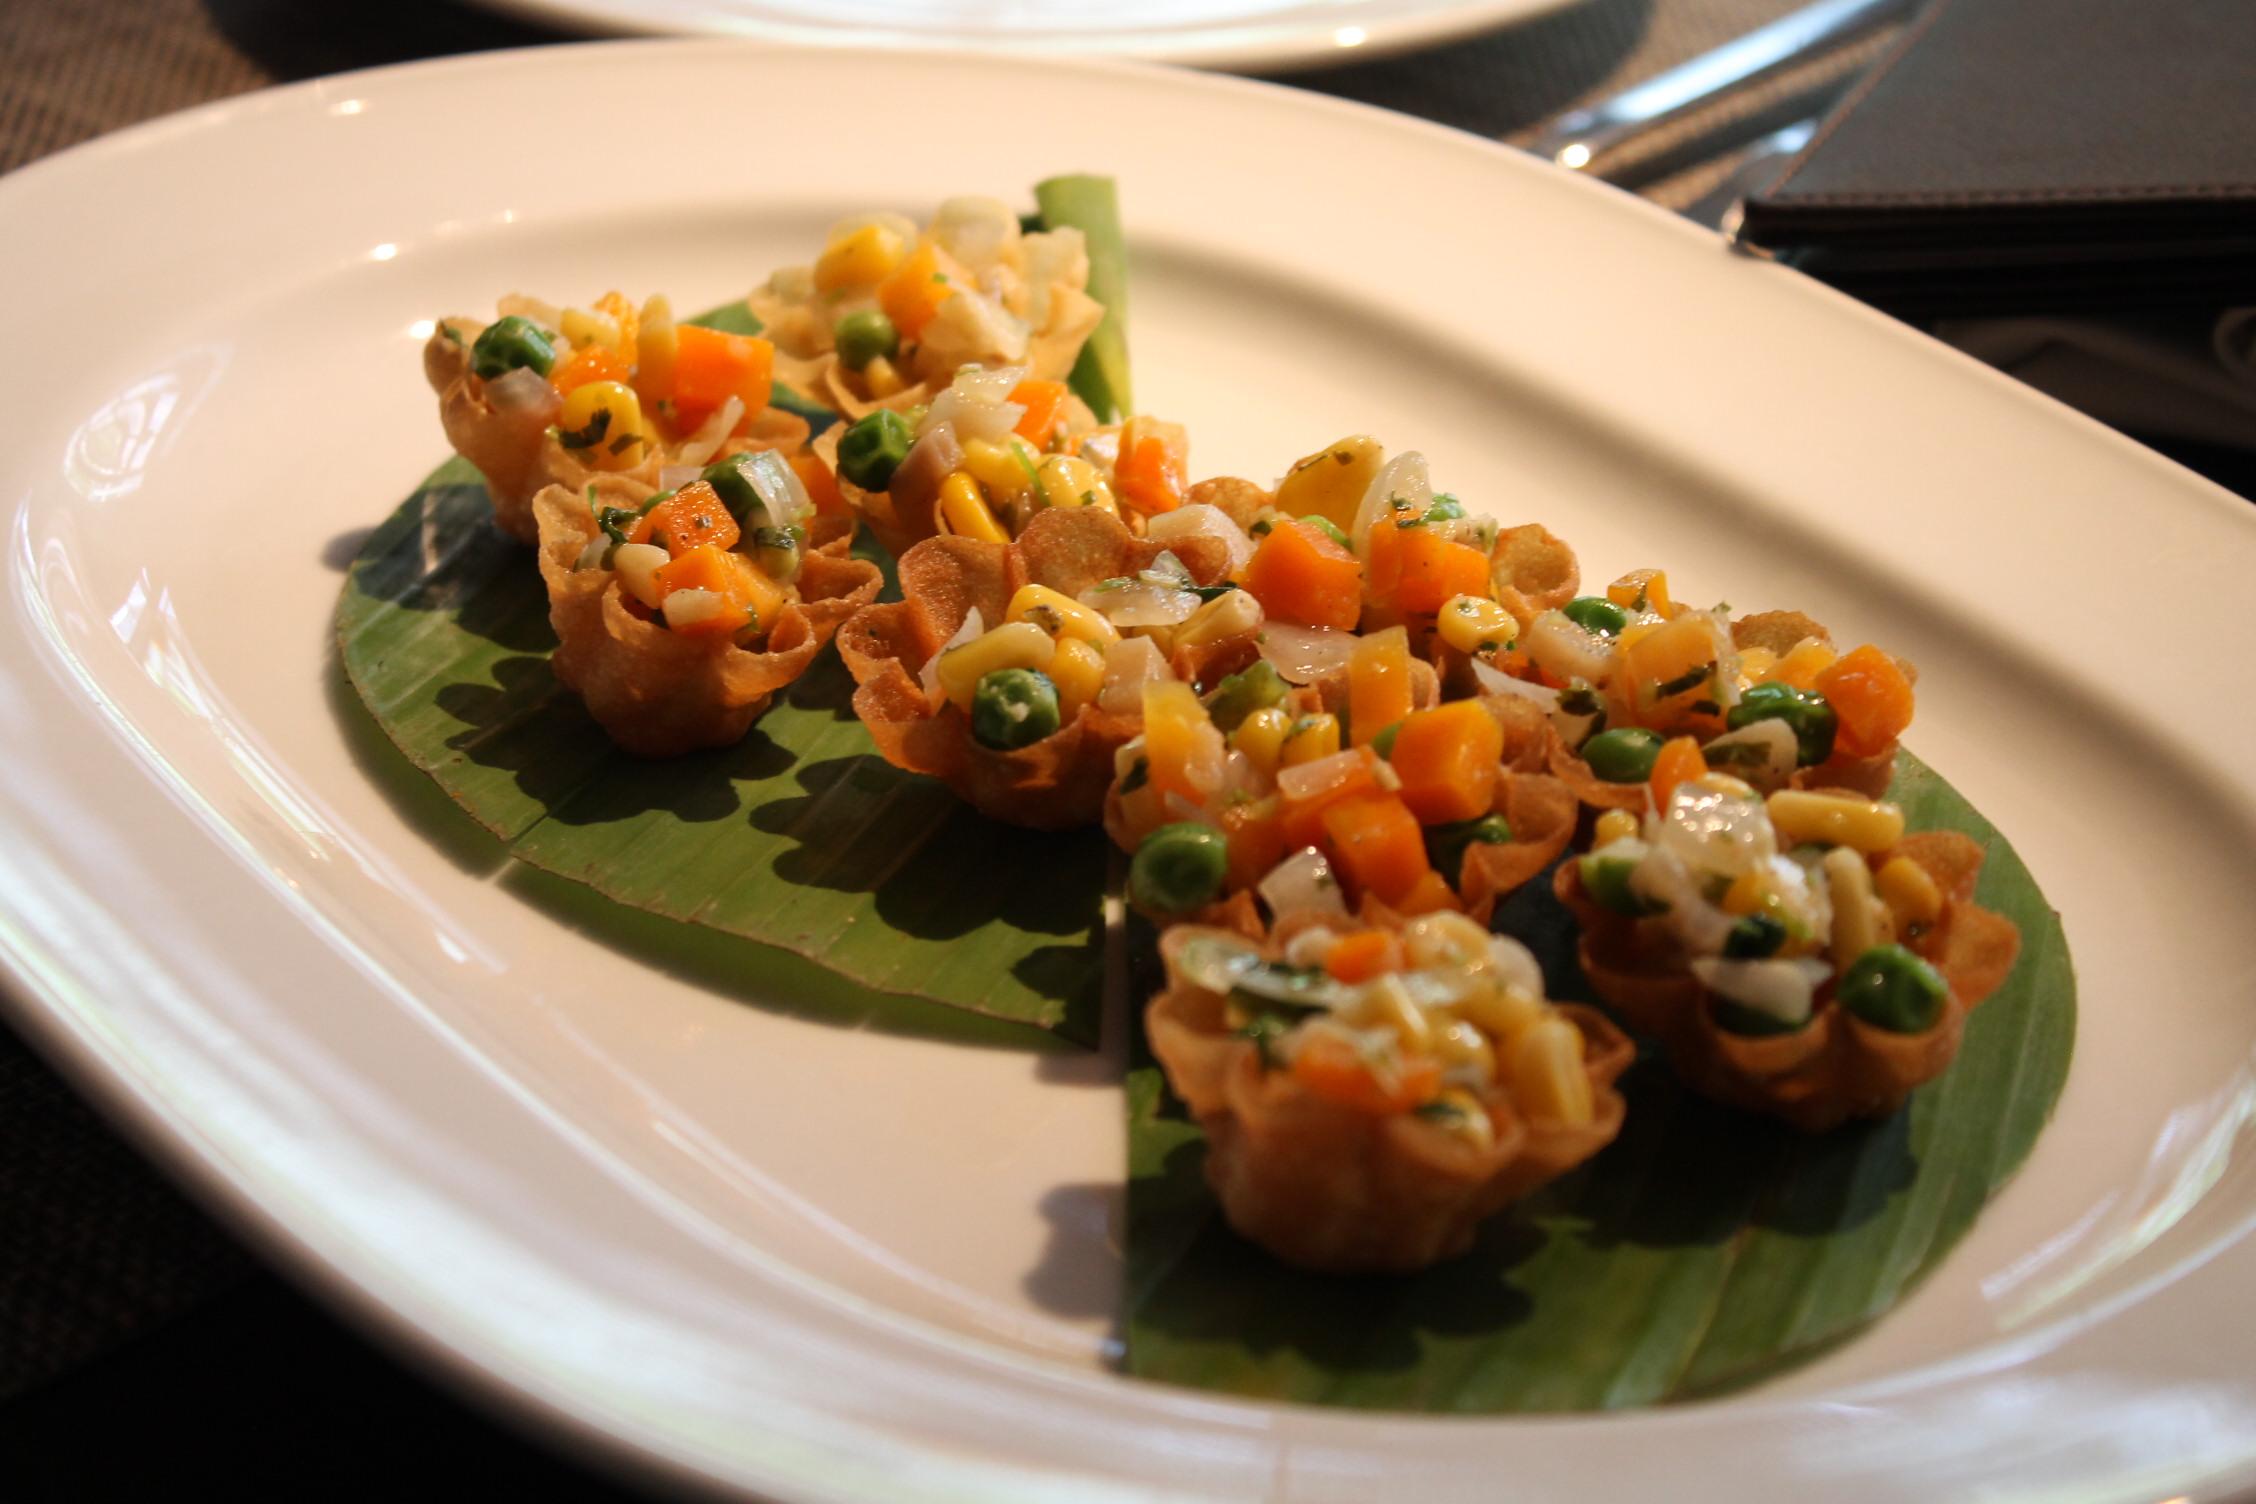 Krathong Thong (Crispy Shell with vegetables